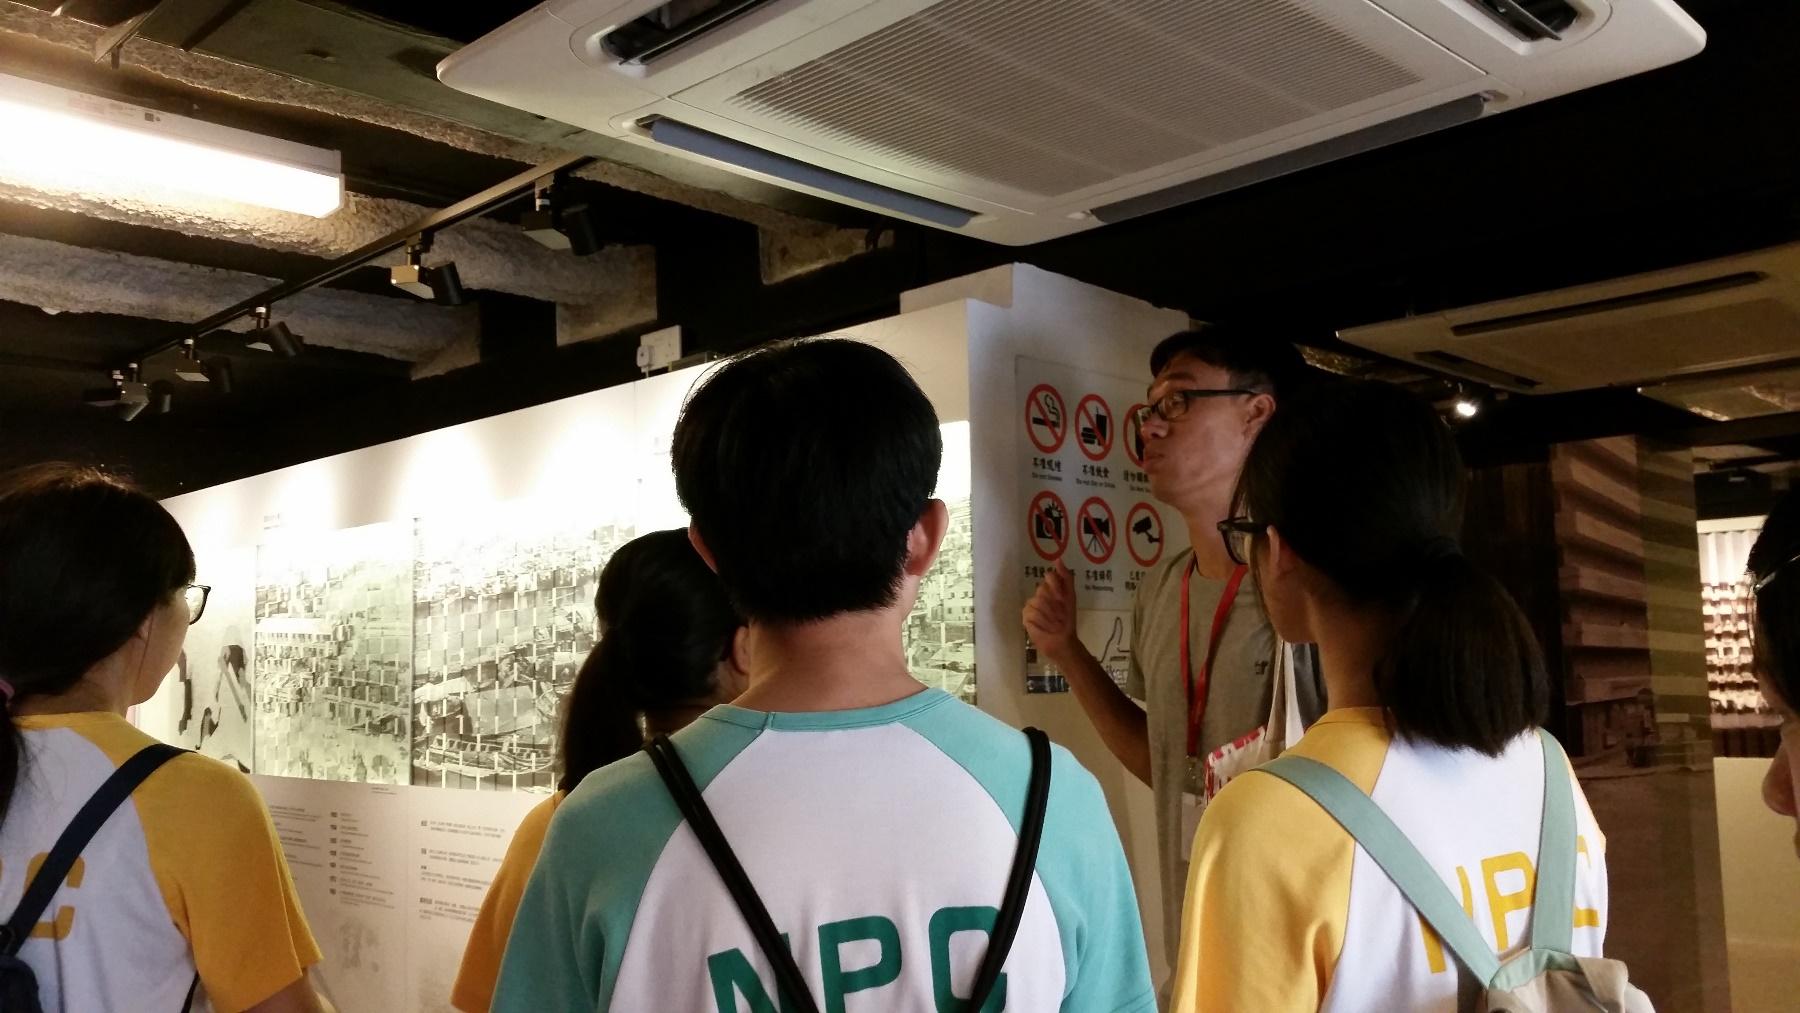 http://npc.edu.hk/sites/default/files/20180712_110022.jpg